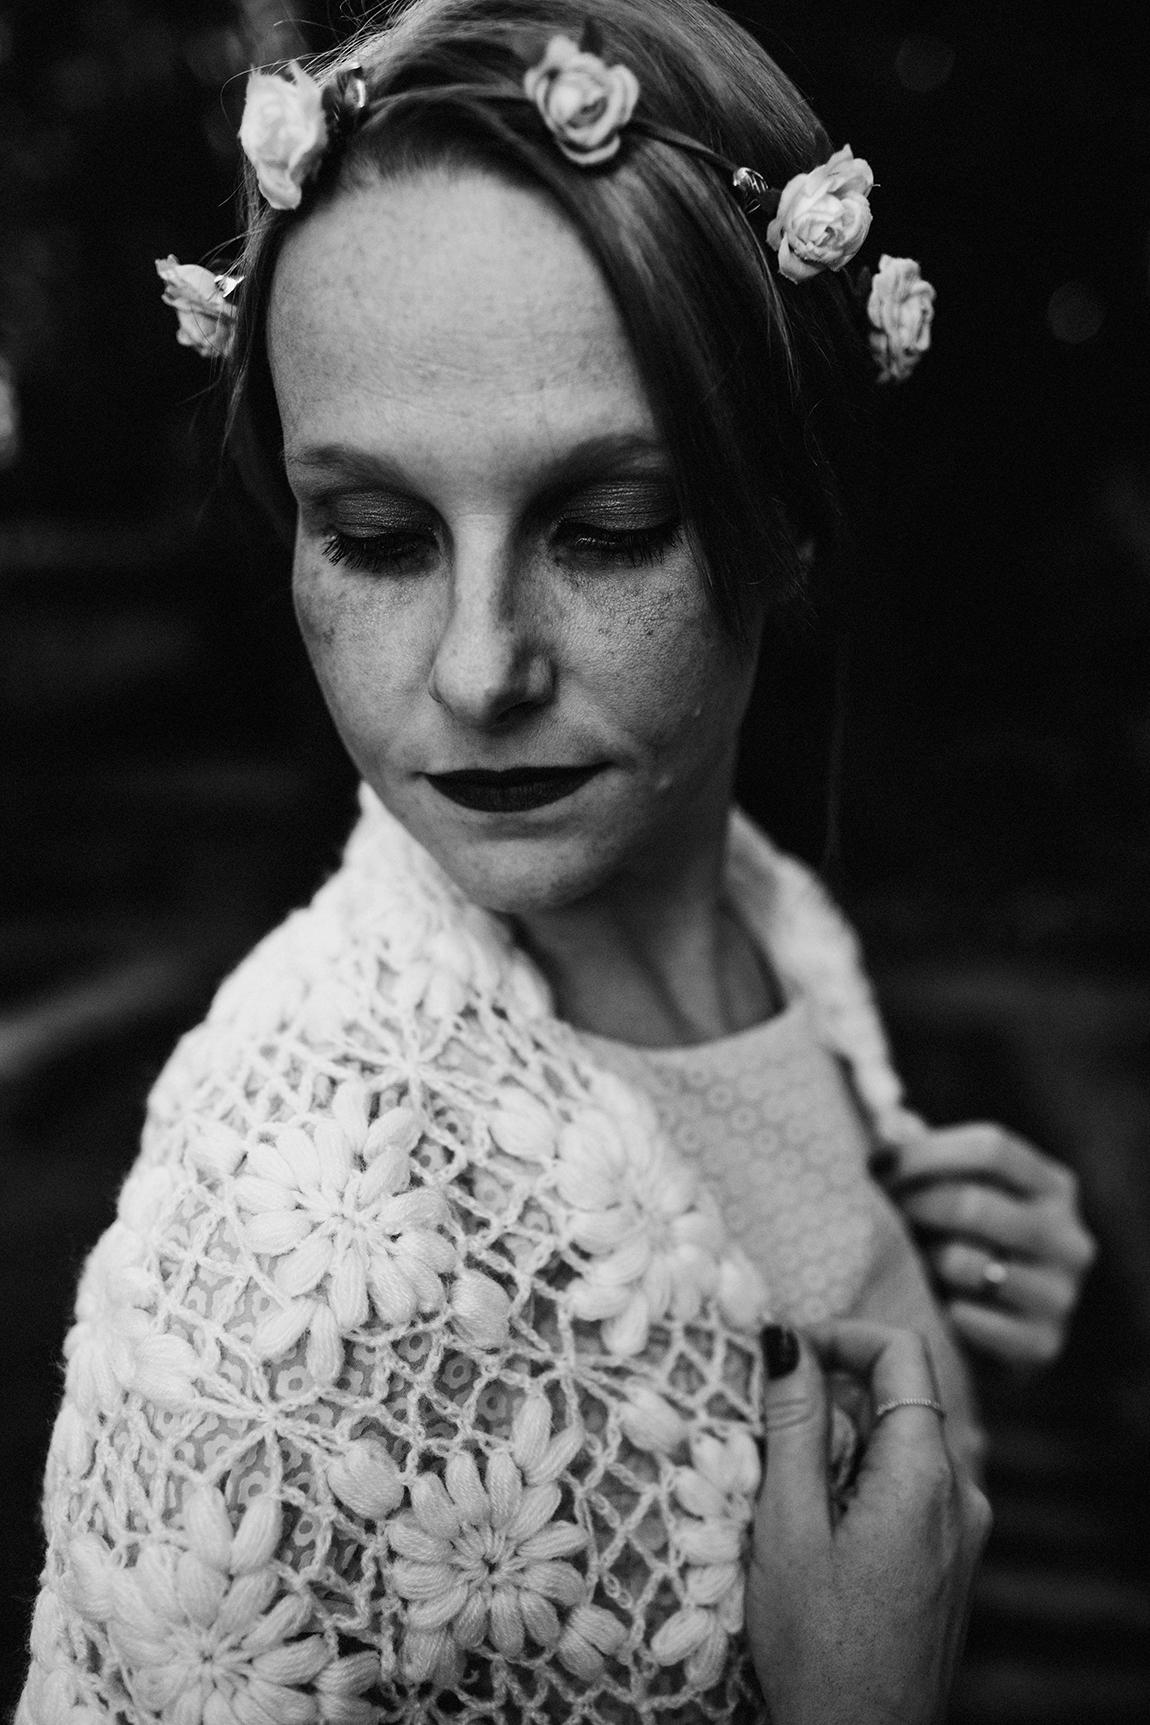 mariana-alves-fotografia-curitiba-ensaio-camila-noiva (44)